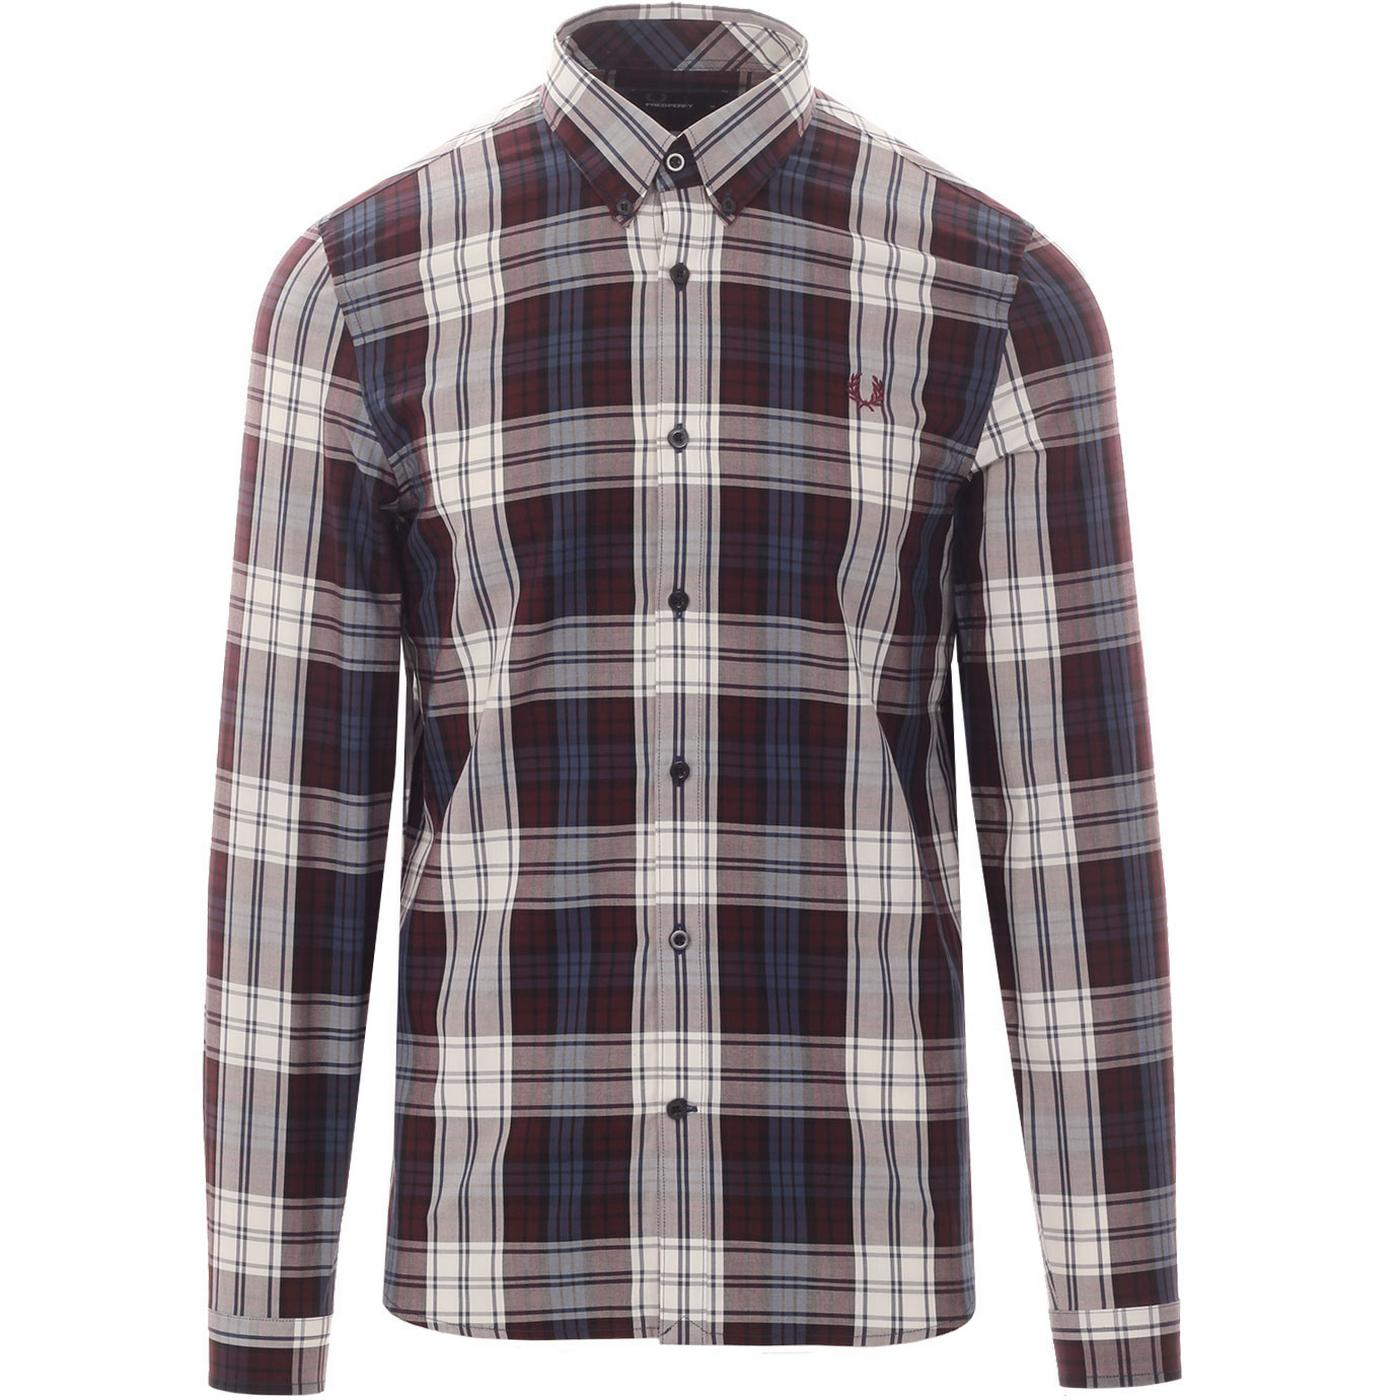 FRED PERRY Men's Mod Bold Tartan Check Shirt M